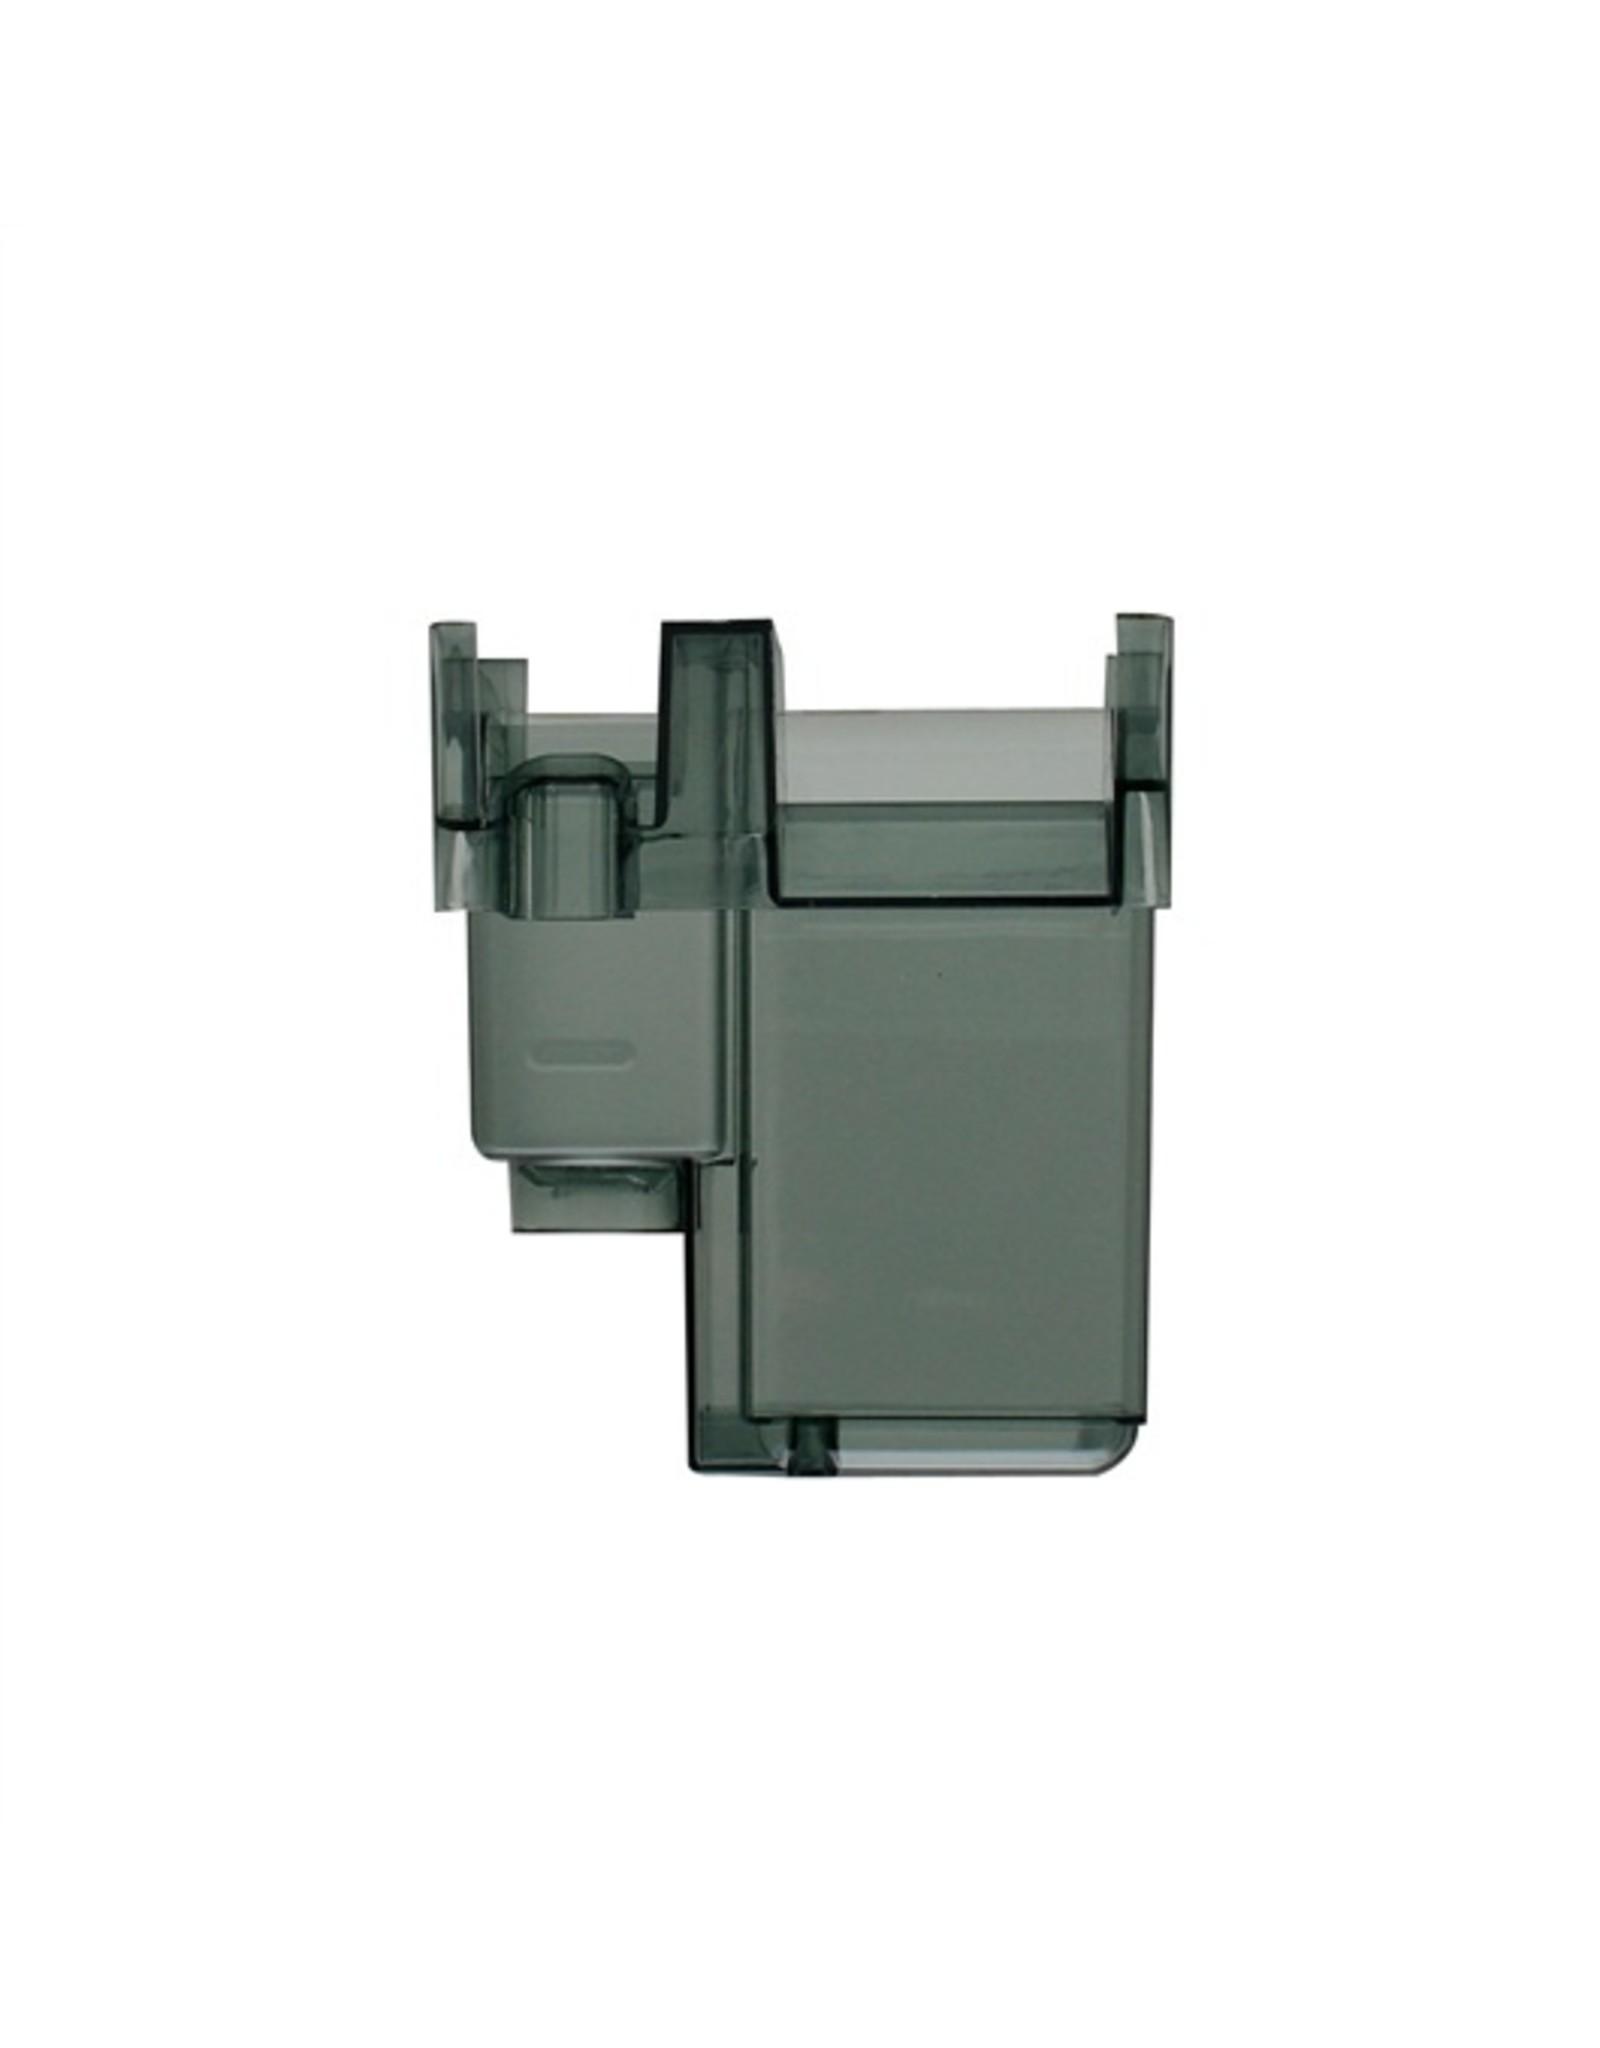 Aquaclear AQUACLEAR Replacement Filter Case